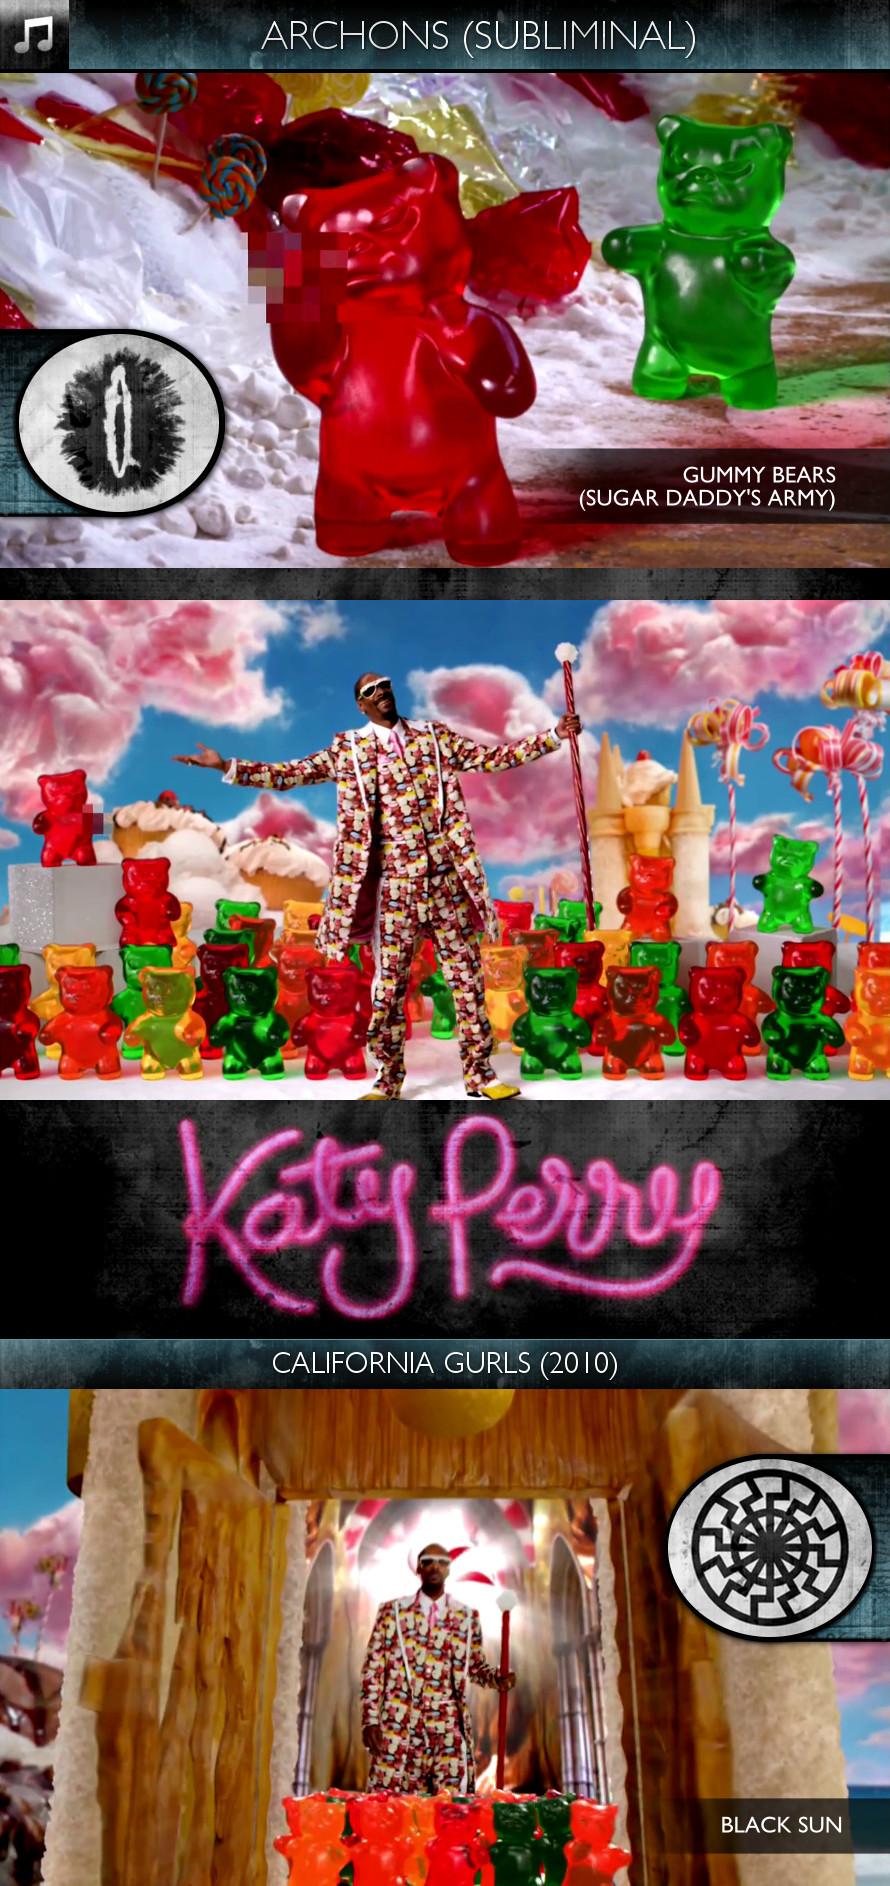 Katy Perry - California Gurls (2010) - Archons - Gummy Bears (Sugar Daddy's Army) - Subliminal